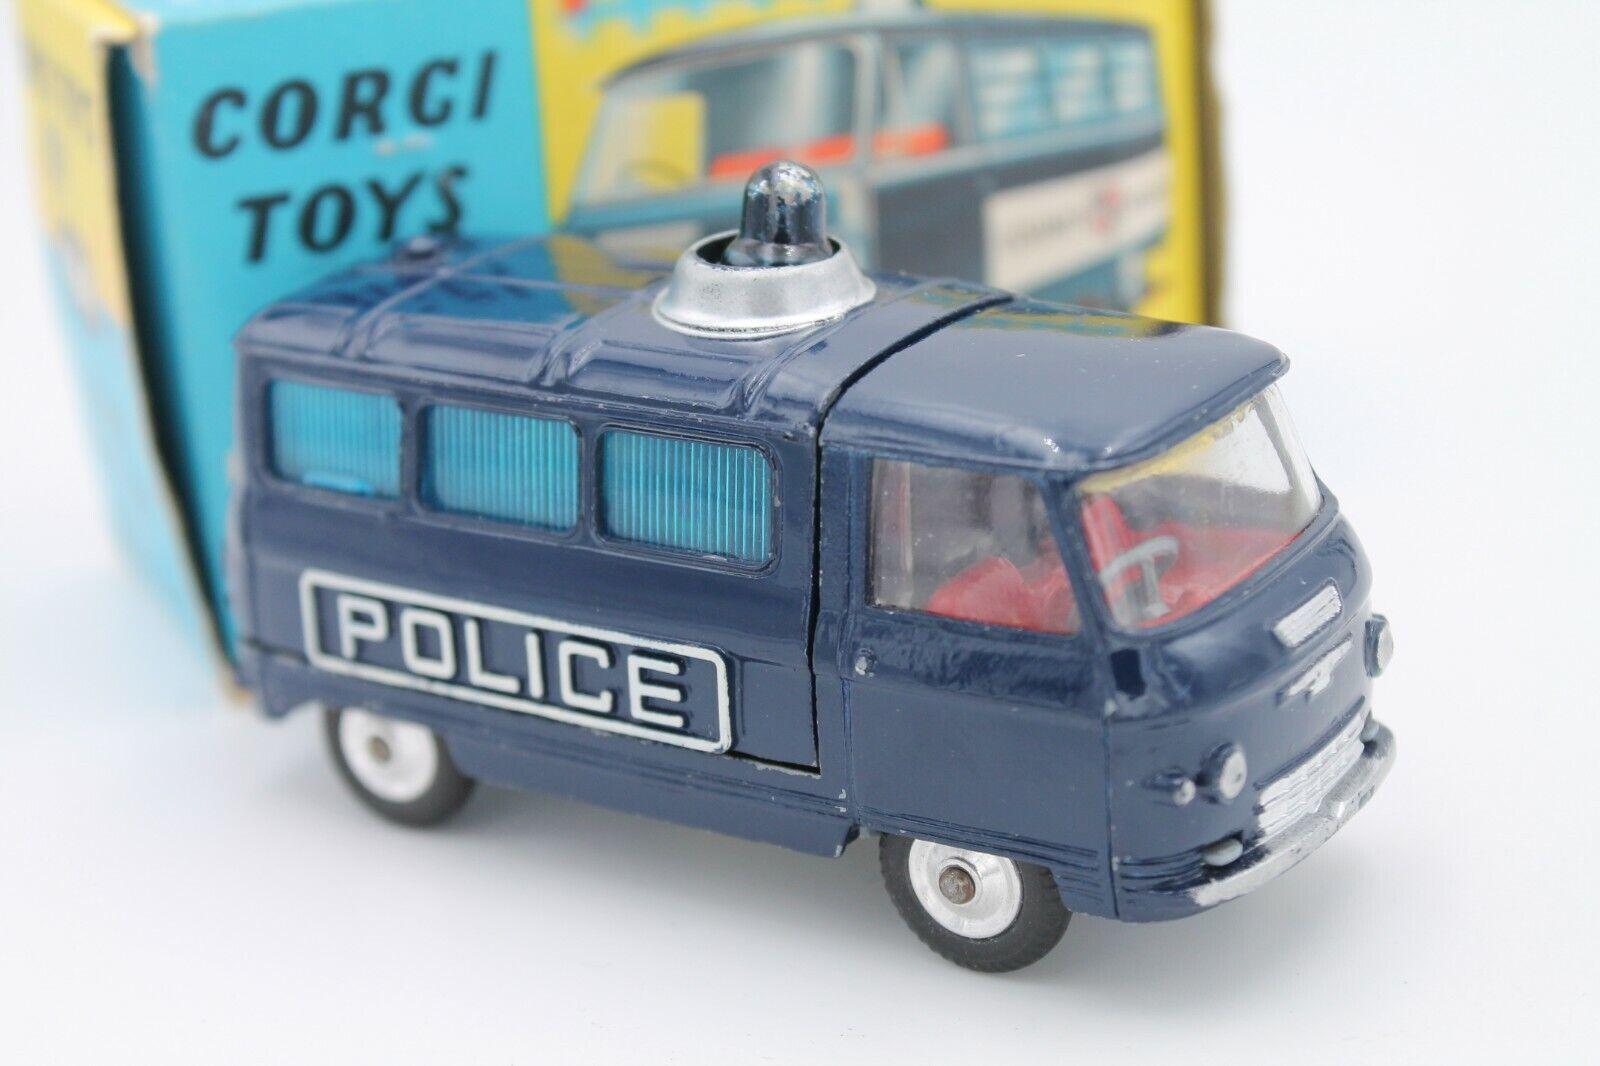 CORGI TOYS 464 * commer police van * 3/4 TON CHASSIS * 1:43 * ORIGINALE